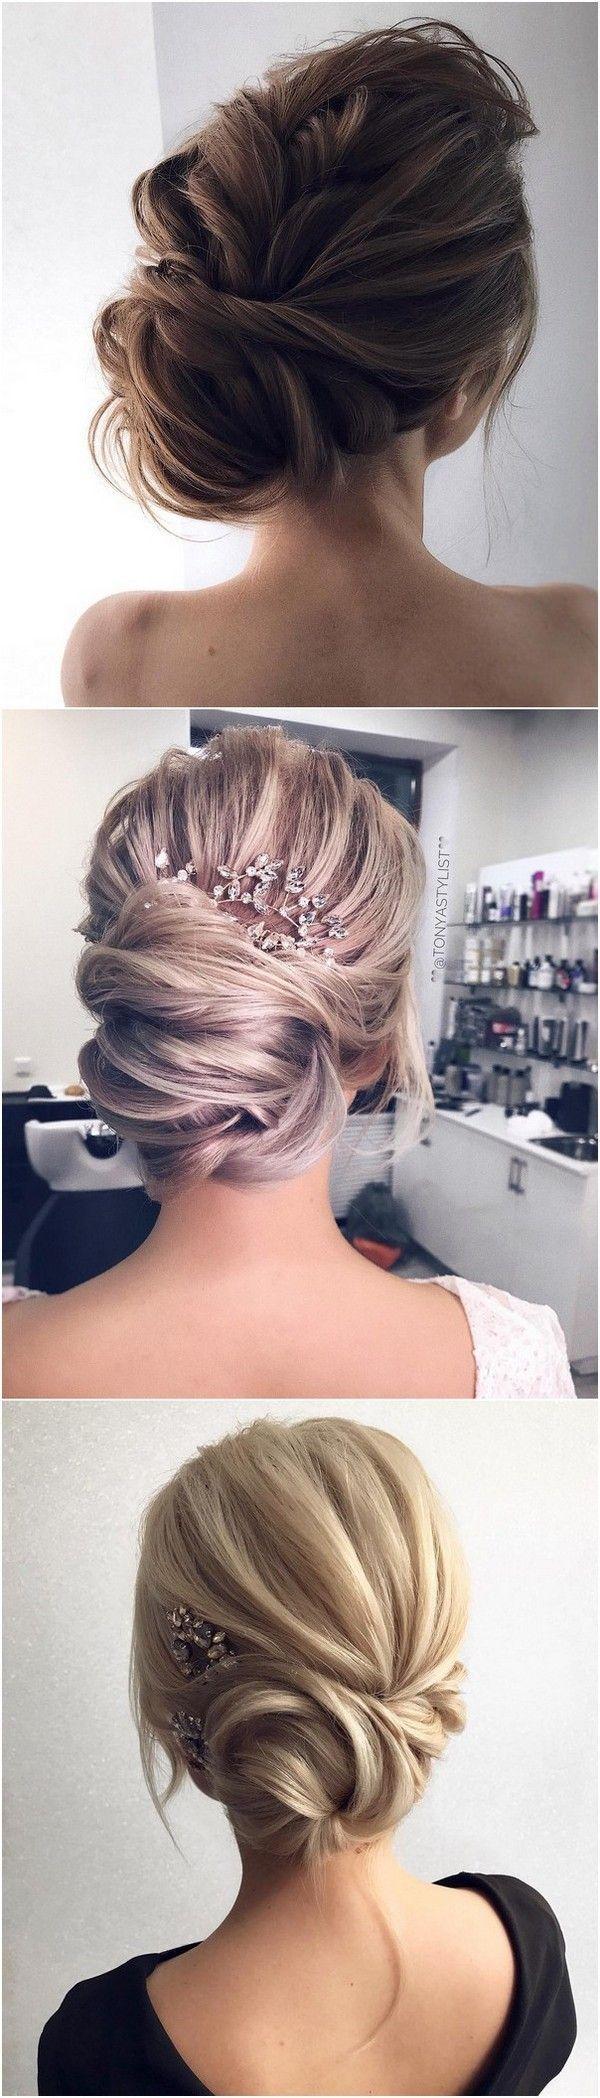 elegant updo wedding hairstyles #weddinghairstyles #bridalfashion #updohairstyles